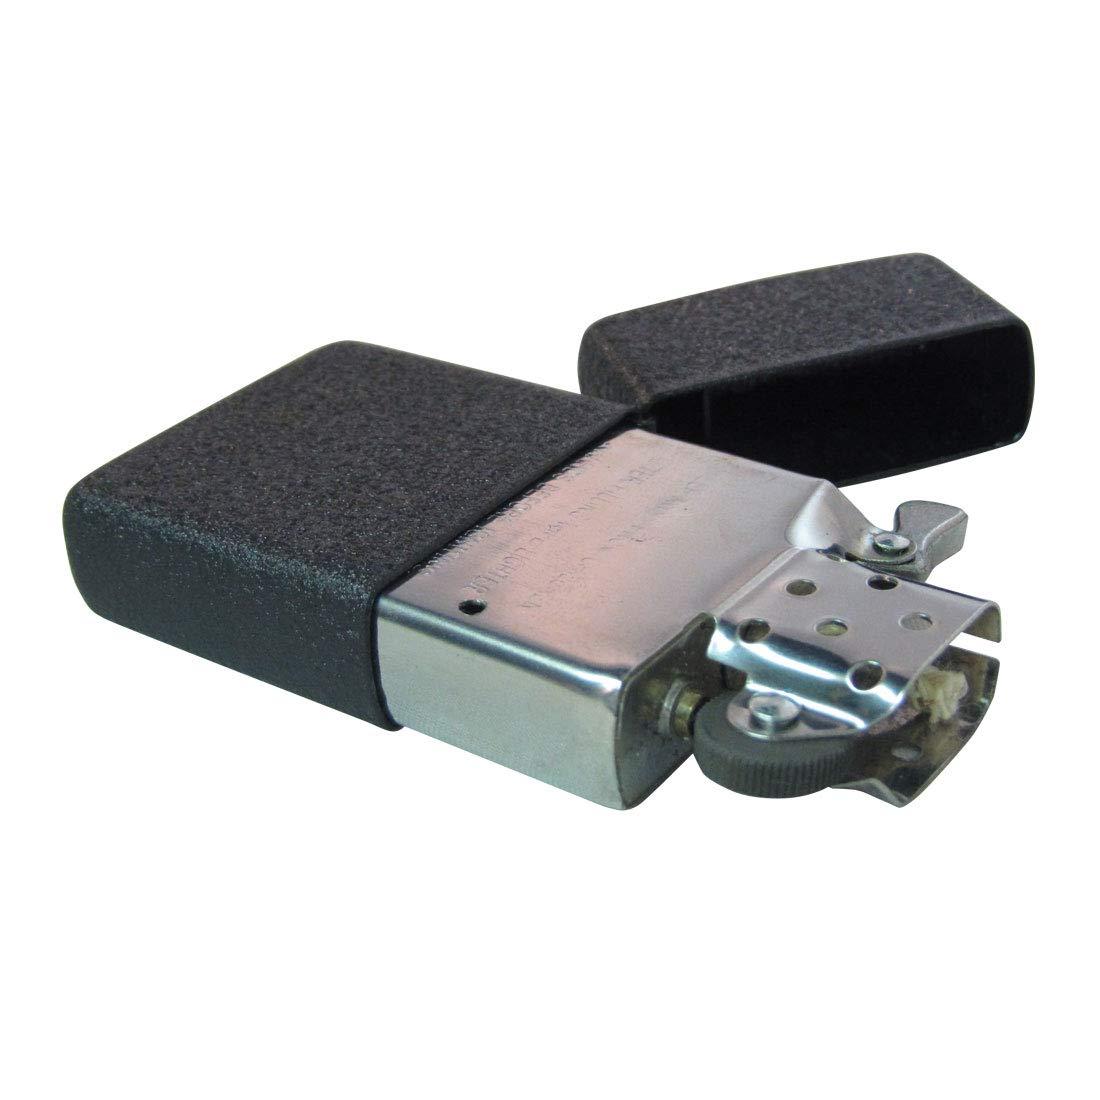 HD高画質500万画素 高級ジッポライター型カメラ B07KP6LWWJ ハイビジョンビデオ撮影&高画質静止画カメラ機能搭載 microSD、SDHC対応 B07KP6LWWJ, ベビー キッズ28:7b6b34c4 --- krianta.ru